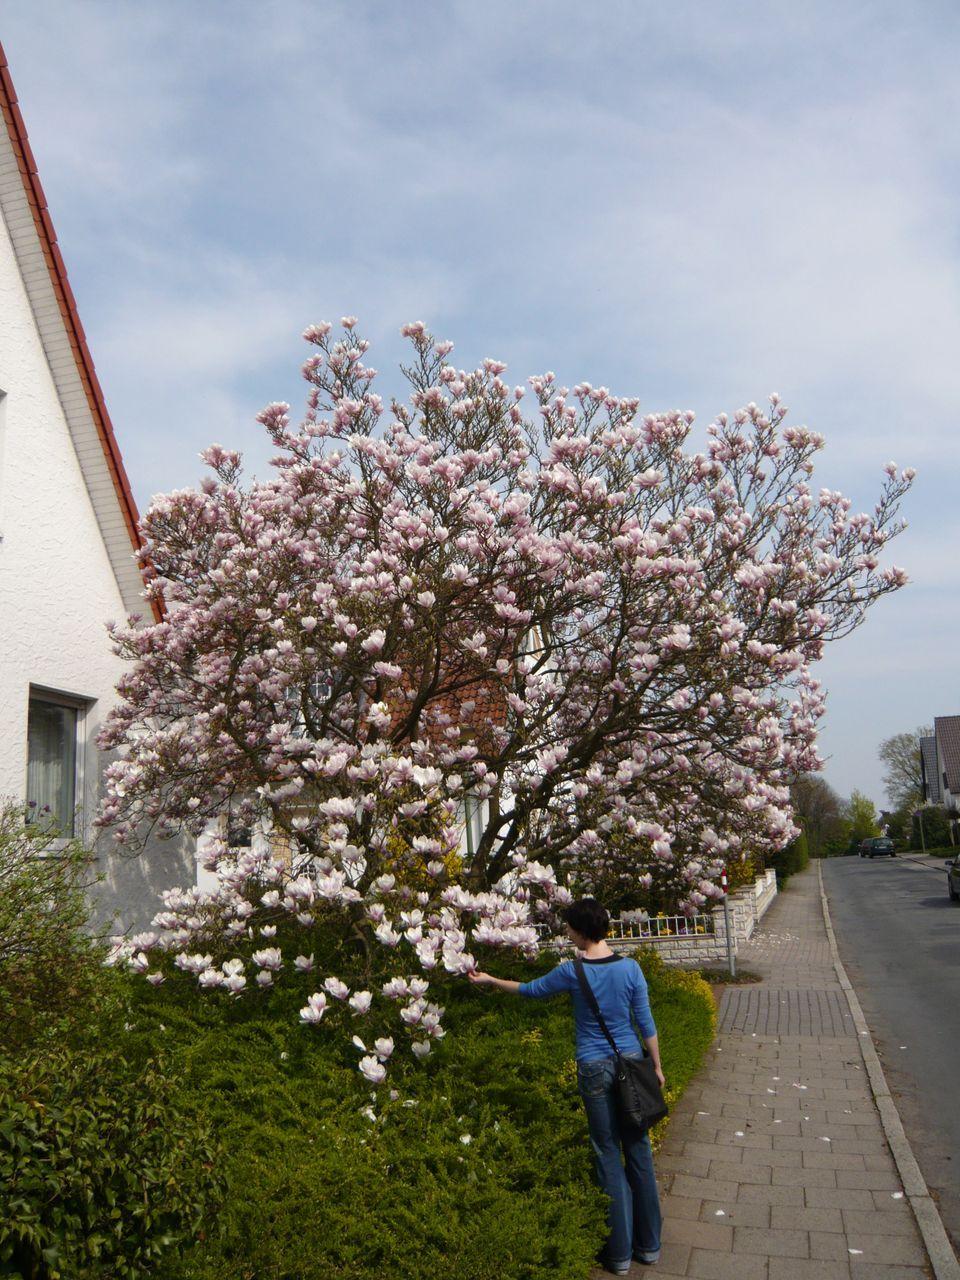 19: Magnolia soulangiana / Tulpen-Magnolie – ein Klassiker unter den Magnolien und blüht in Tulpenform bereits am April